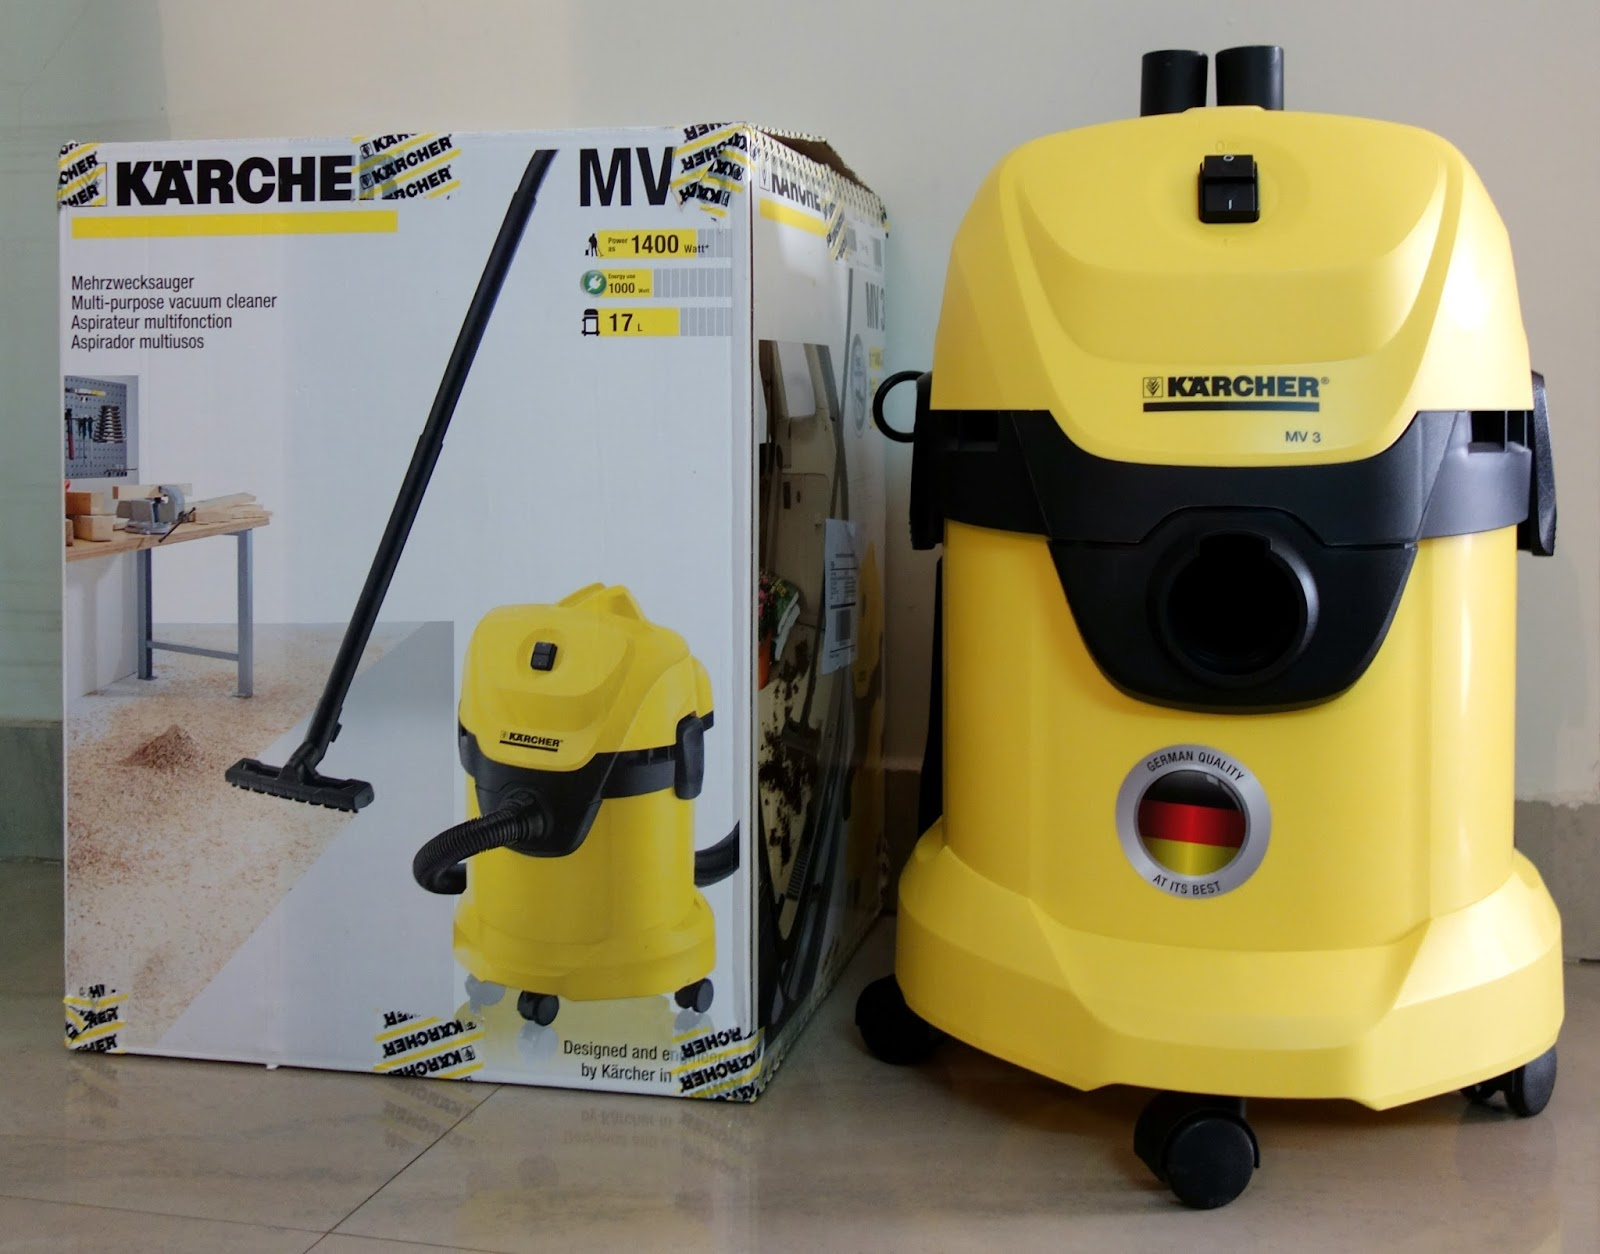 Karcher MV3 Vacuum Cleaner Review